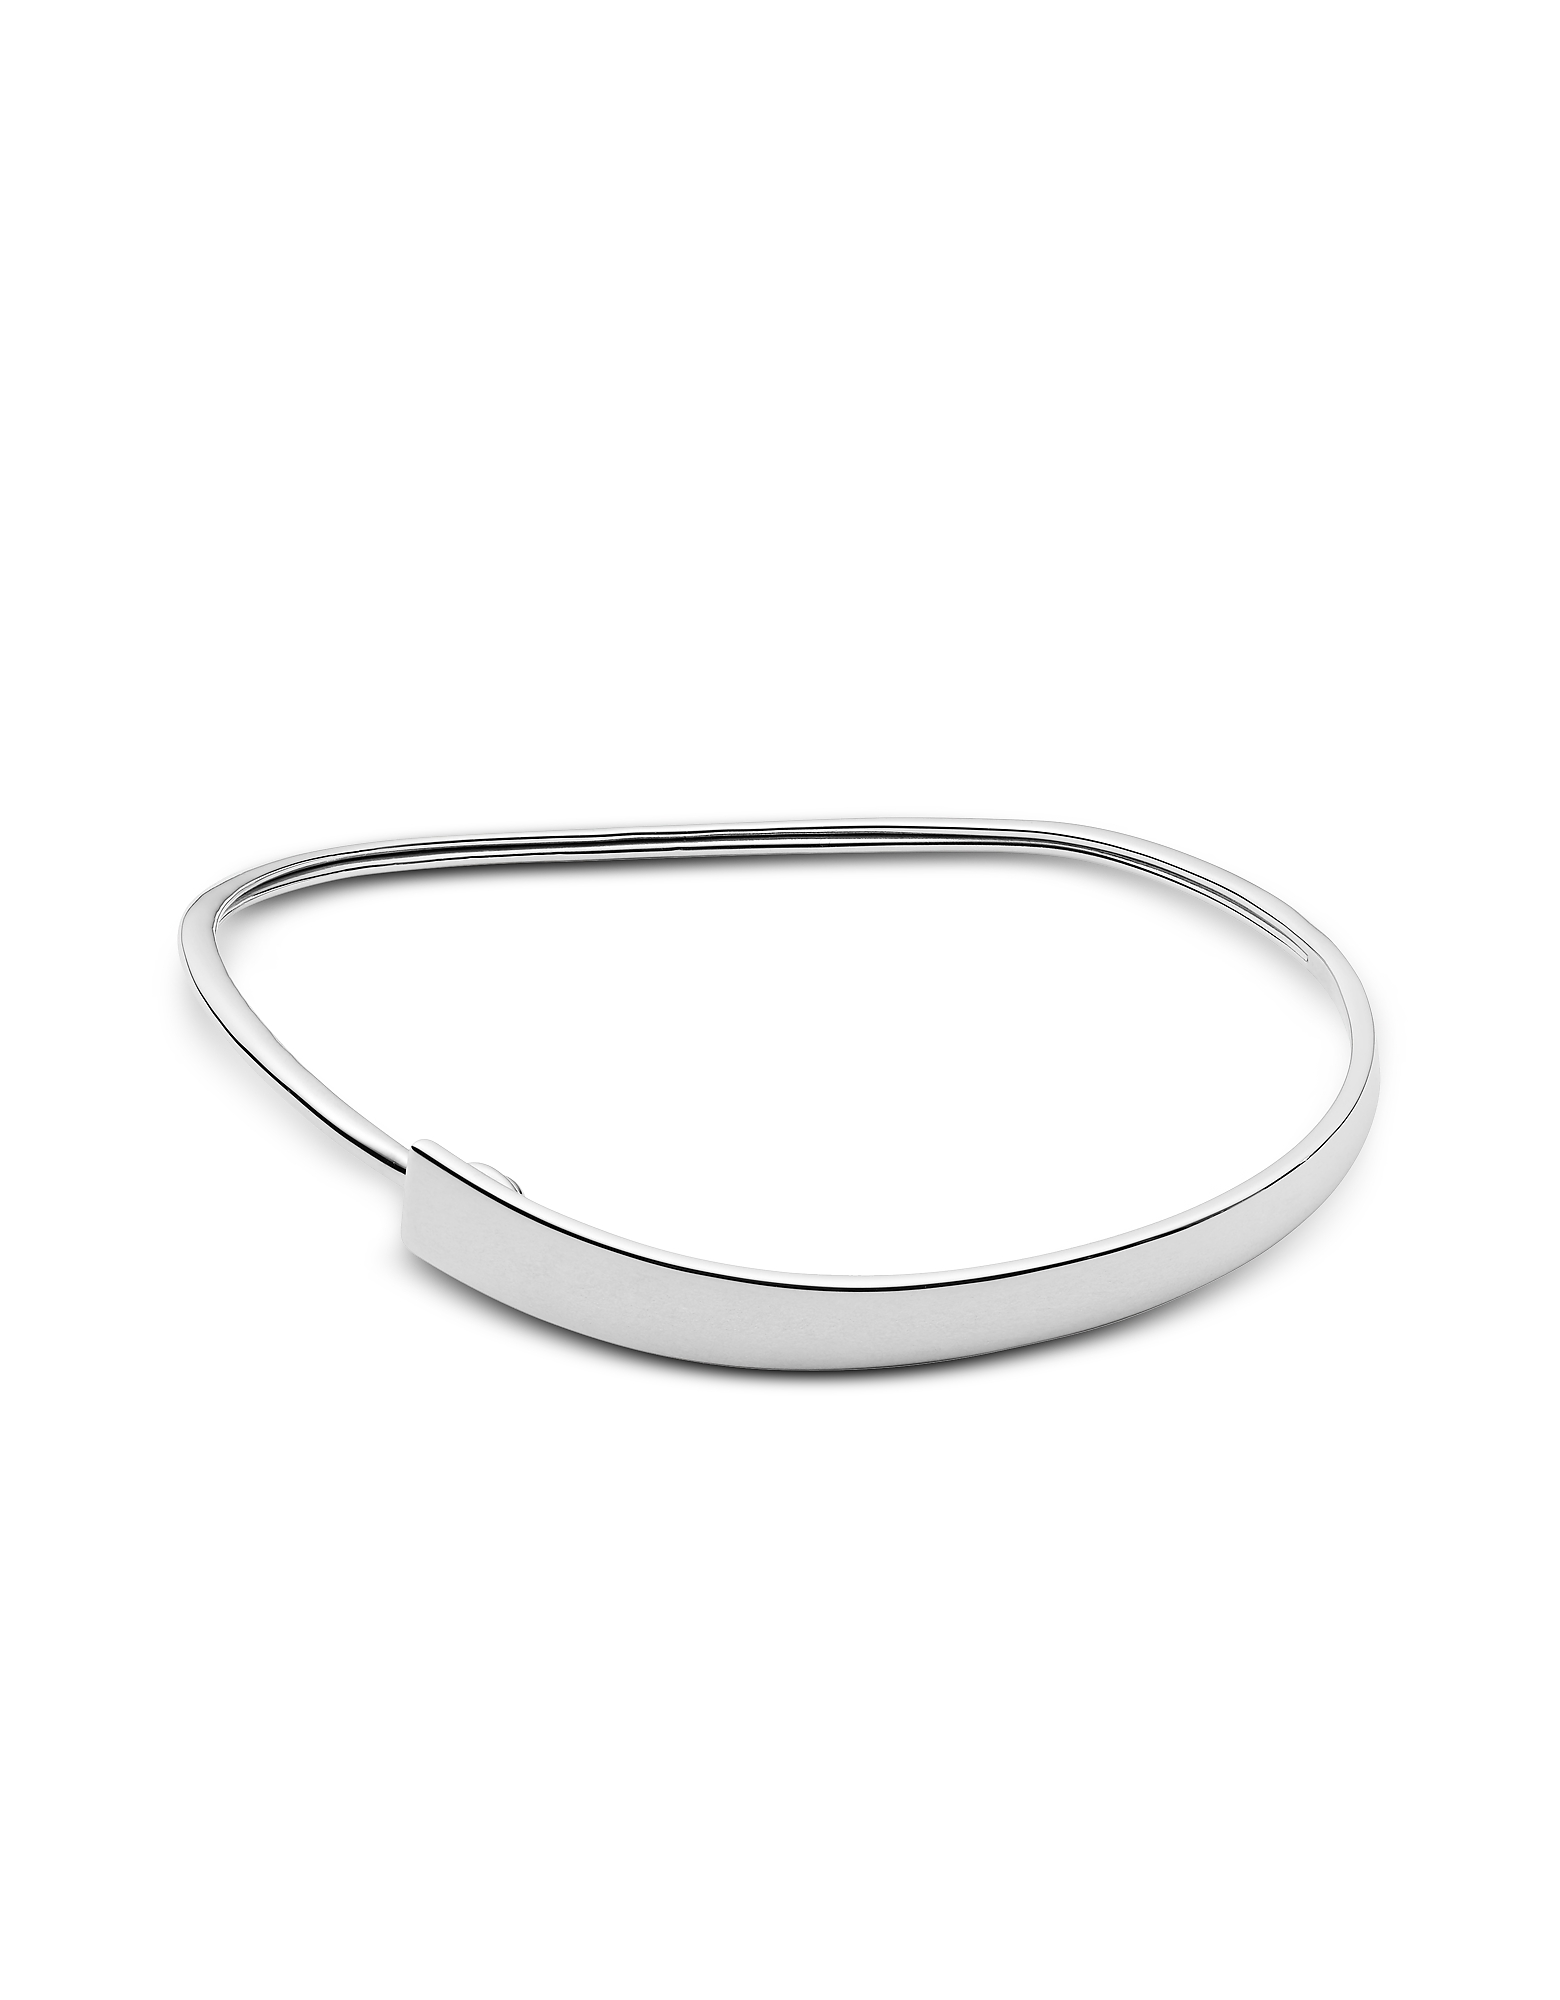 Skagen Bracelets, Kariana Silver-Tone Bangle